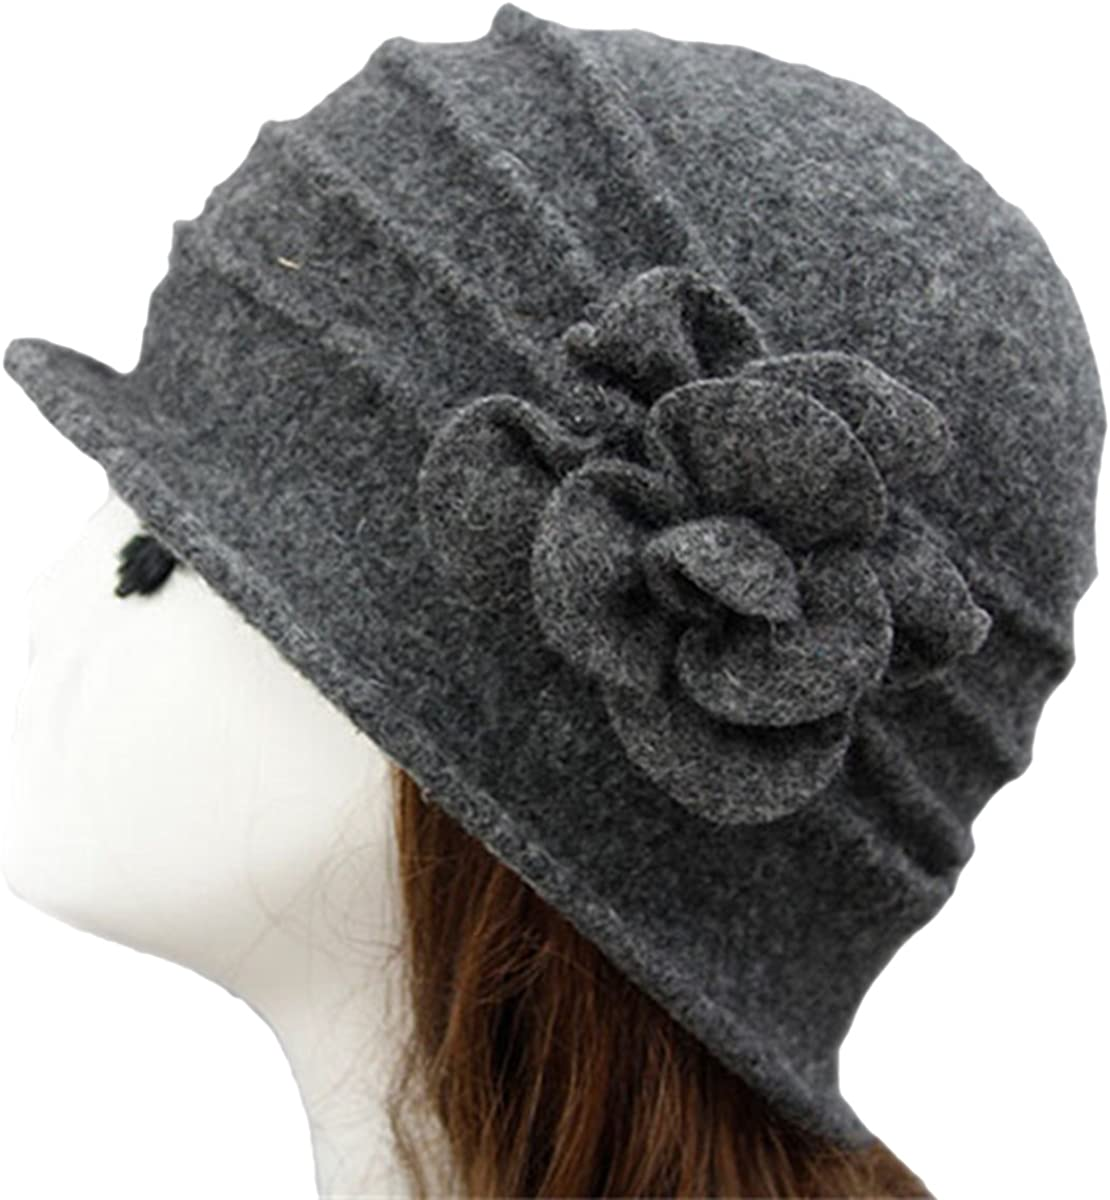 iKulilky Damen Winter Wolle Bucket Hut Vintage Cloche Bowler Cap Beret M/ütze Topfhut Blumendetail Billycock Derby Beanies Hat